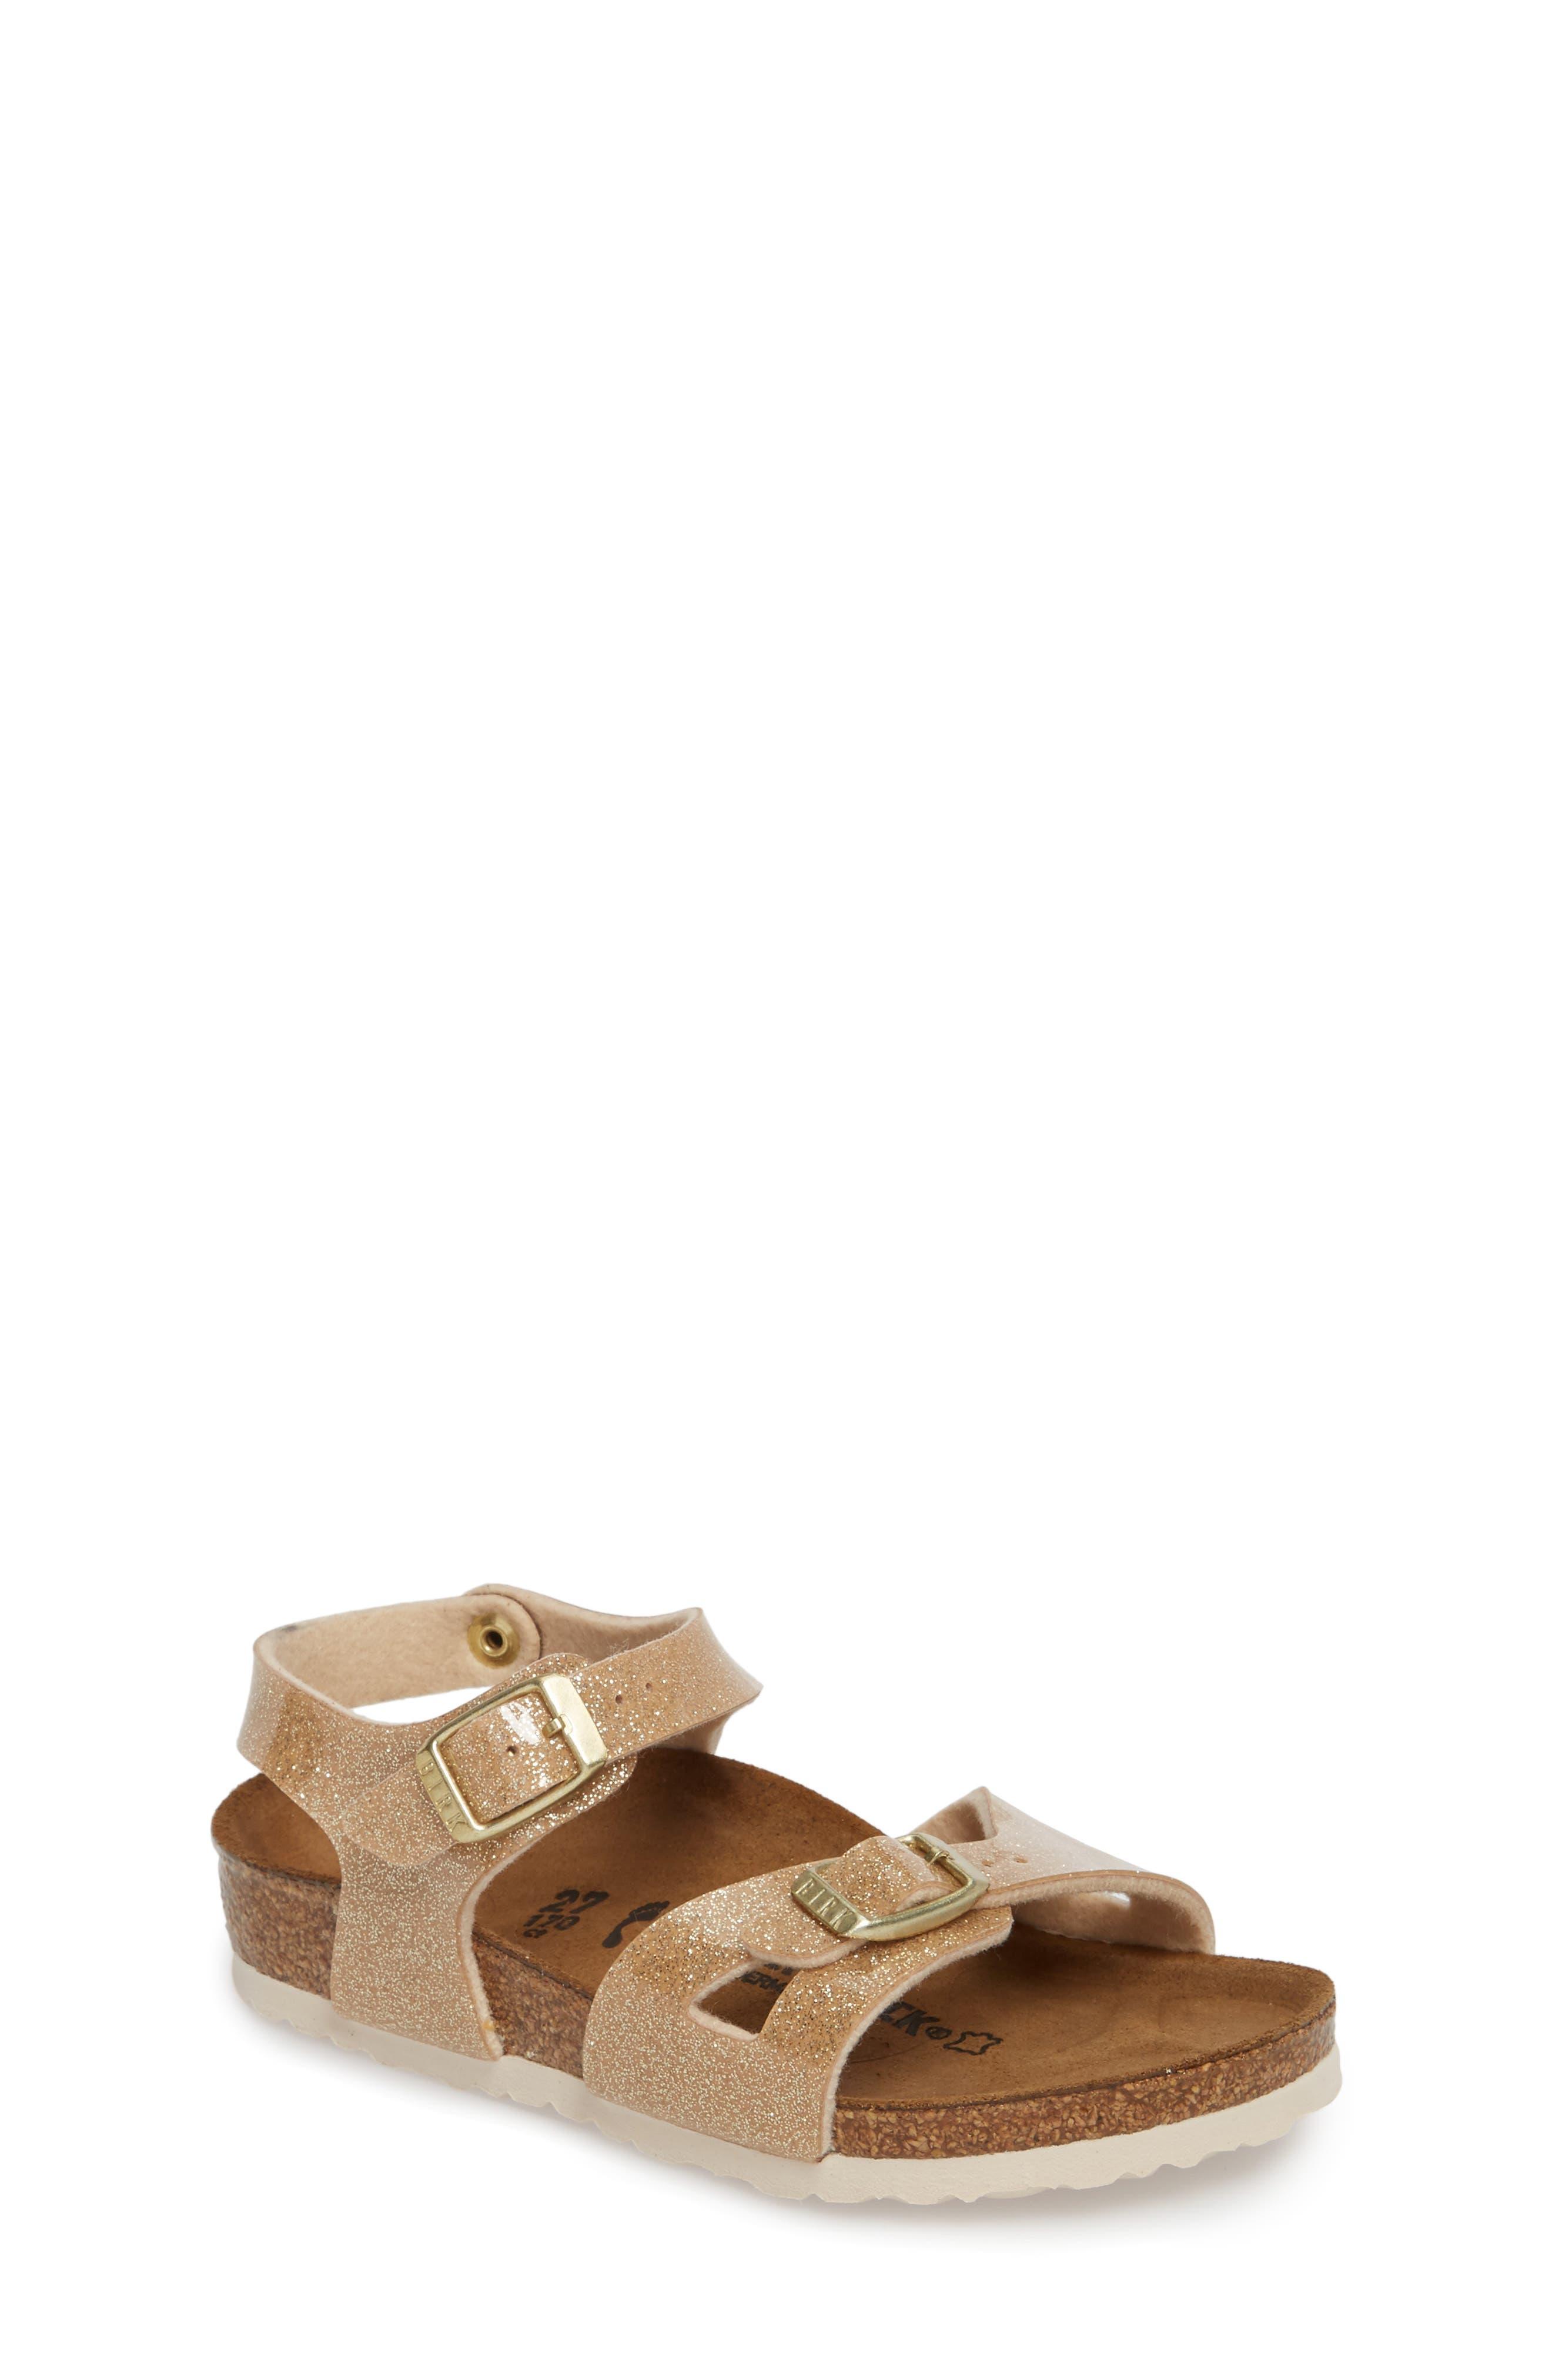 'Rio' Sandal,                         Main,                         color, Galaxy Gold